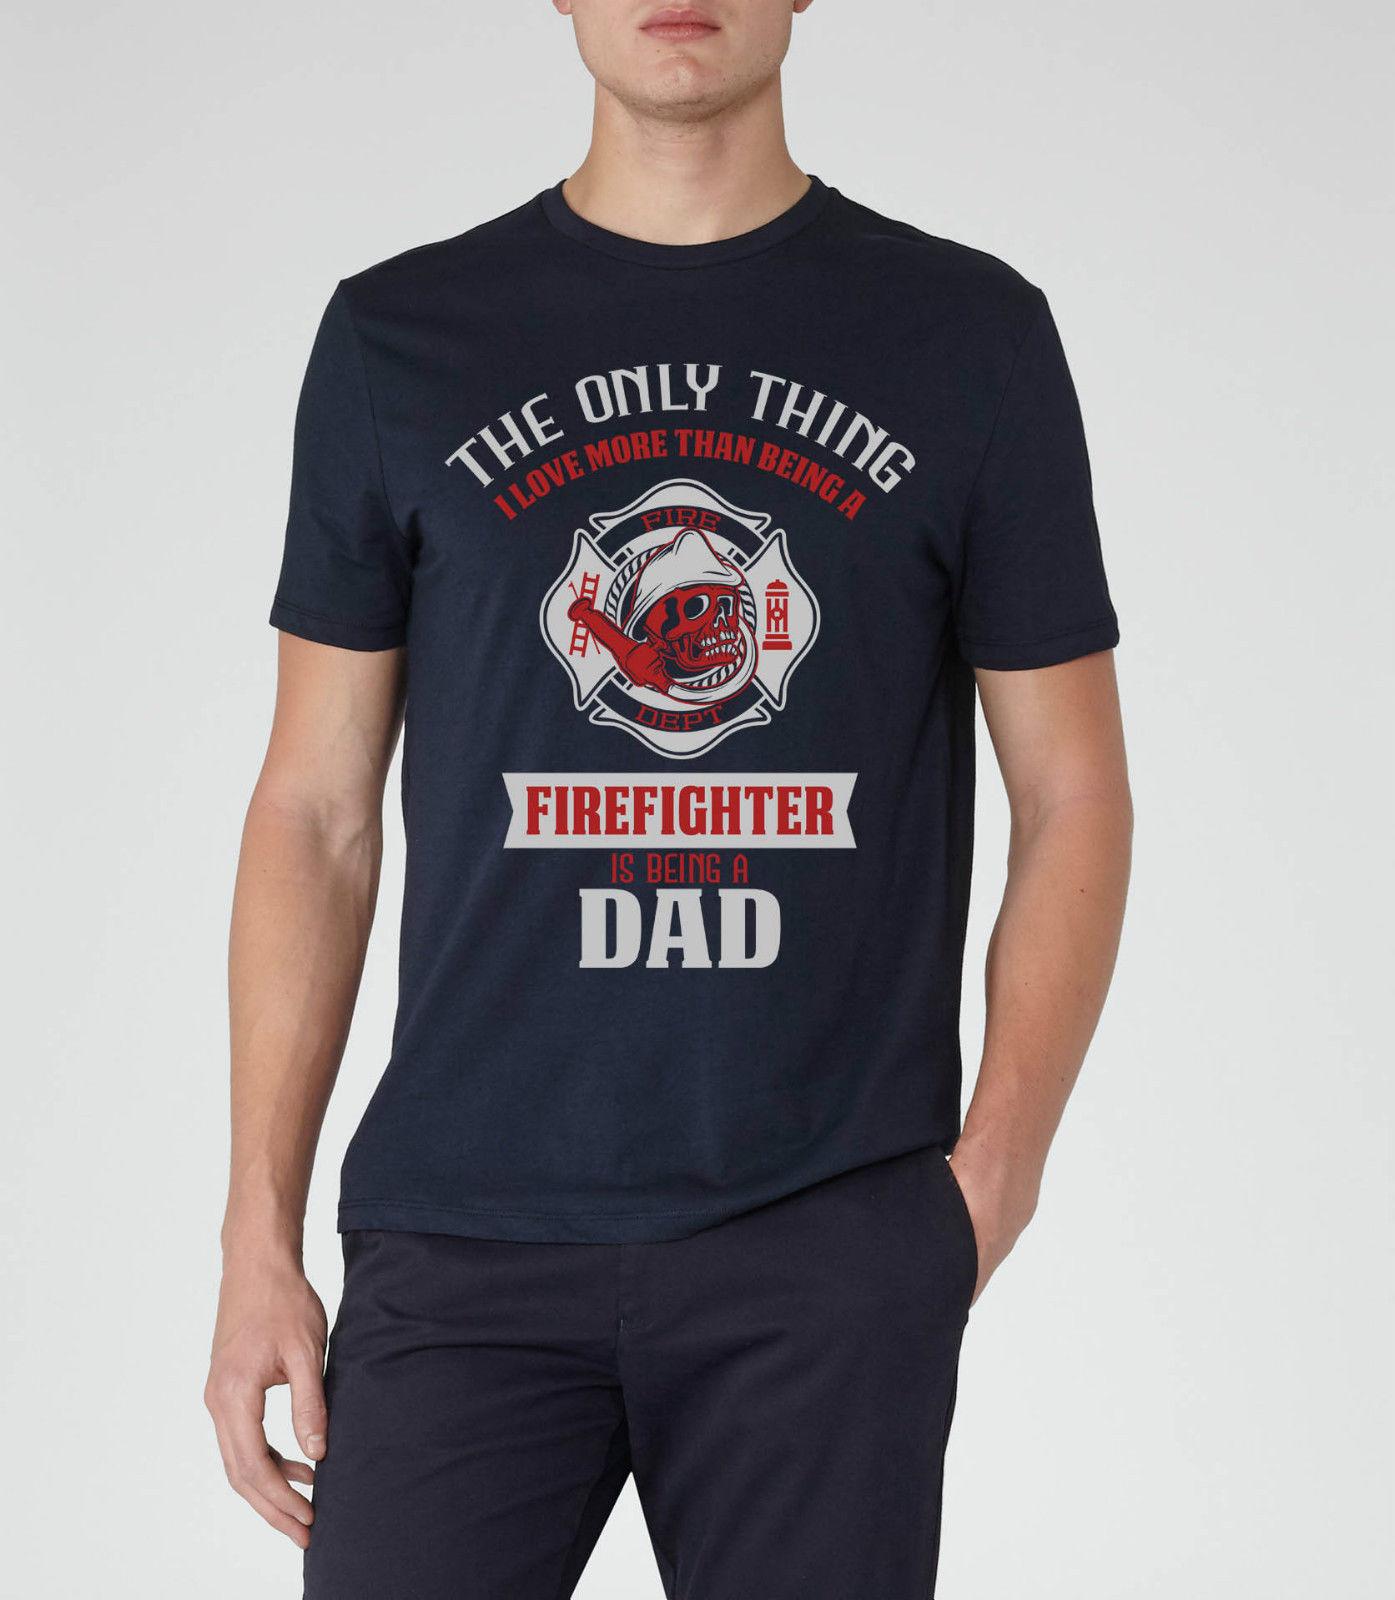 FIREMAN T 셔츠 DAD FIREFIGHTER UNIFORM 반팔 새로운 패션 T 셔츠 남성 의류 성인 캐주얼 티셔츠 탑 티즈